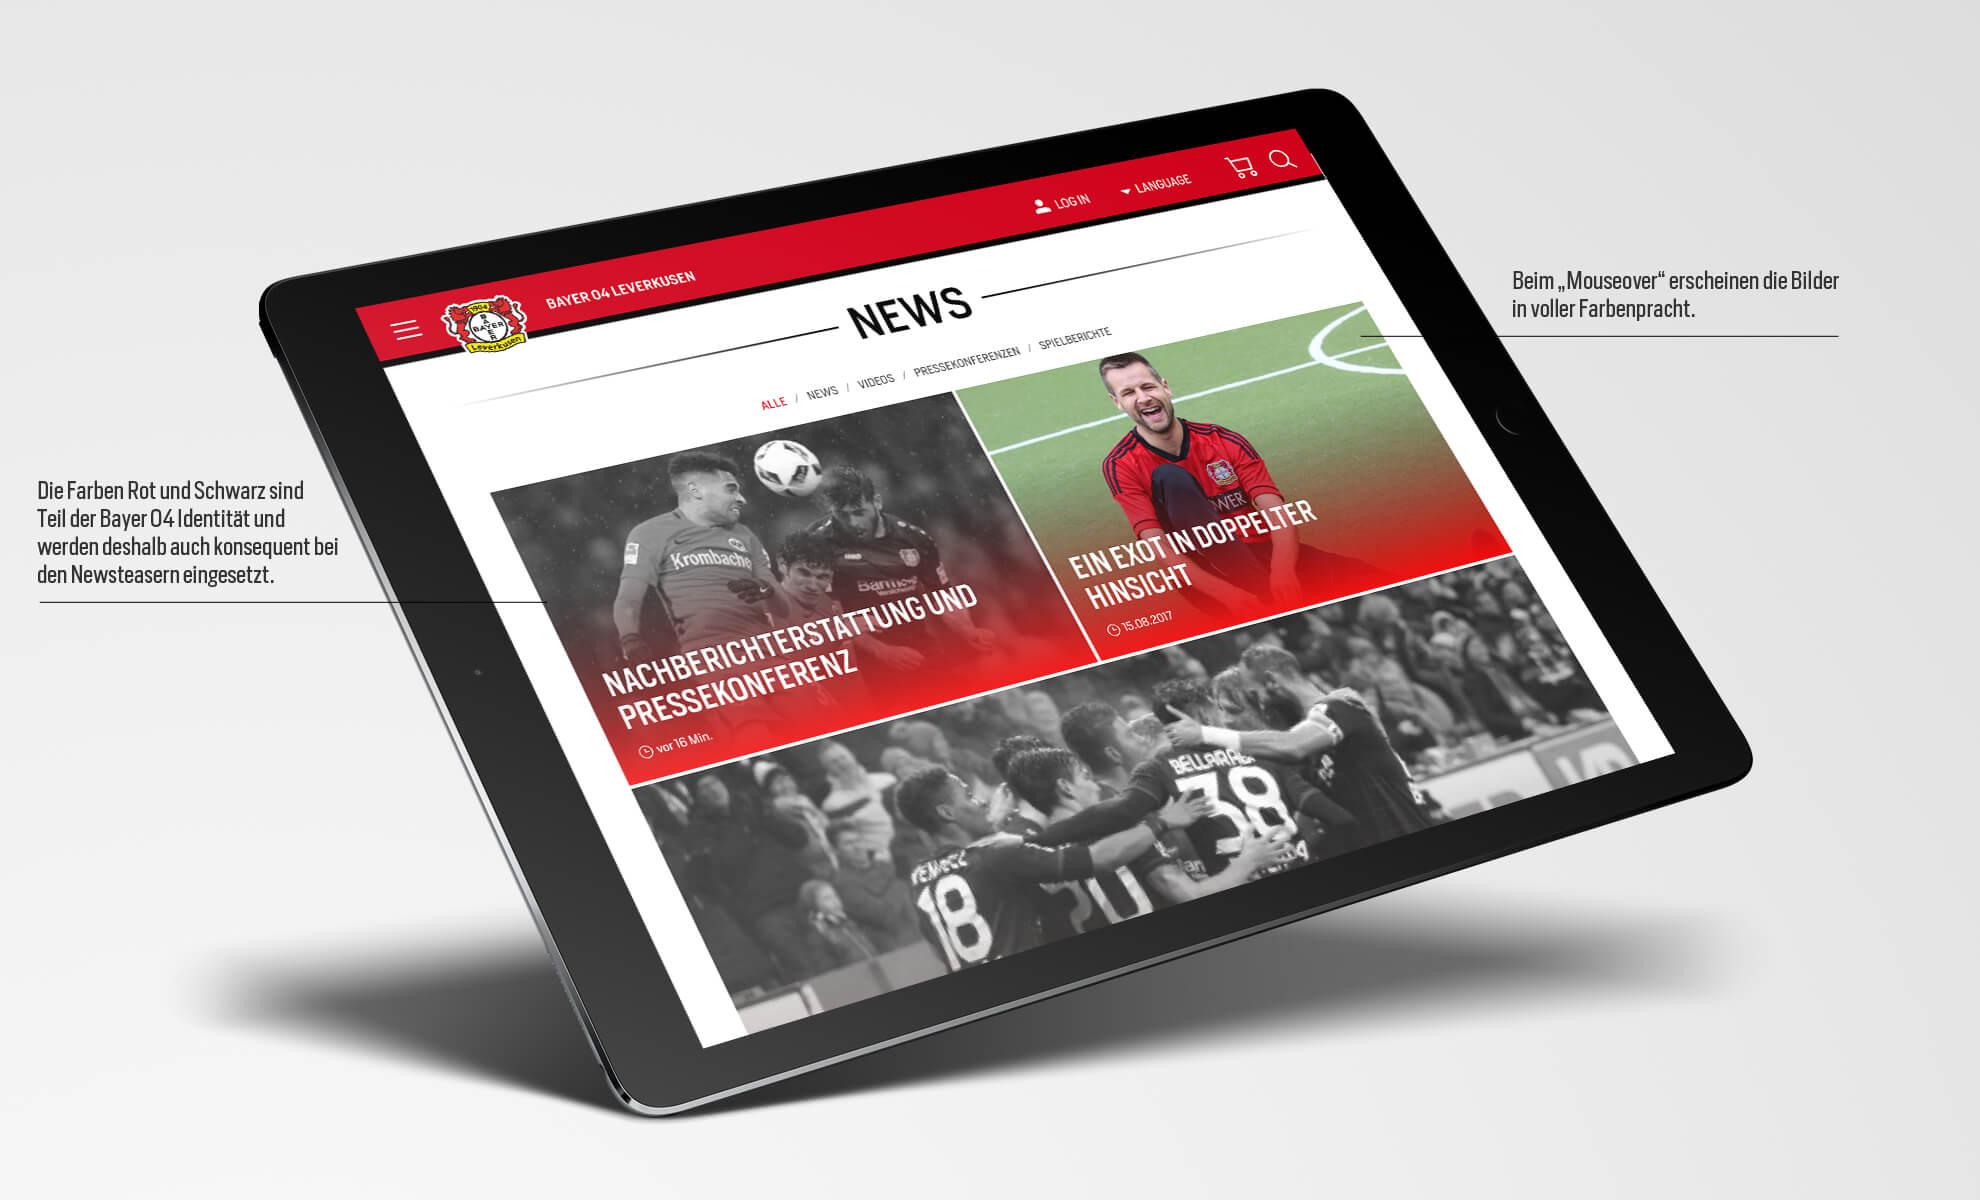 Bayer 04 Leverkusen Website, Relaunch, Redesign, Webdesign, UX, UI, ipad, News Hub